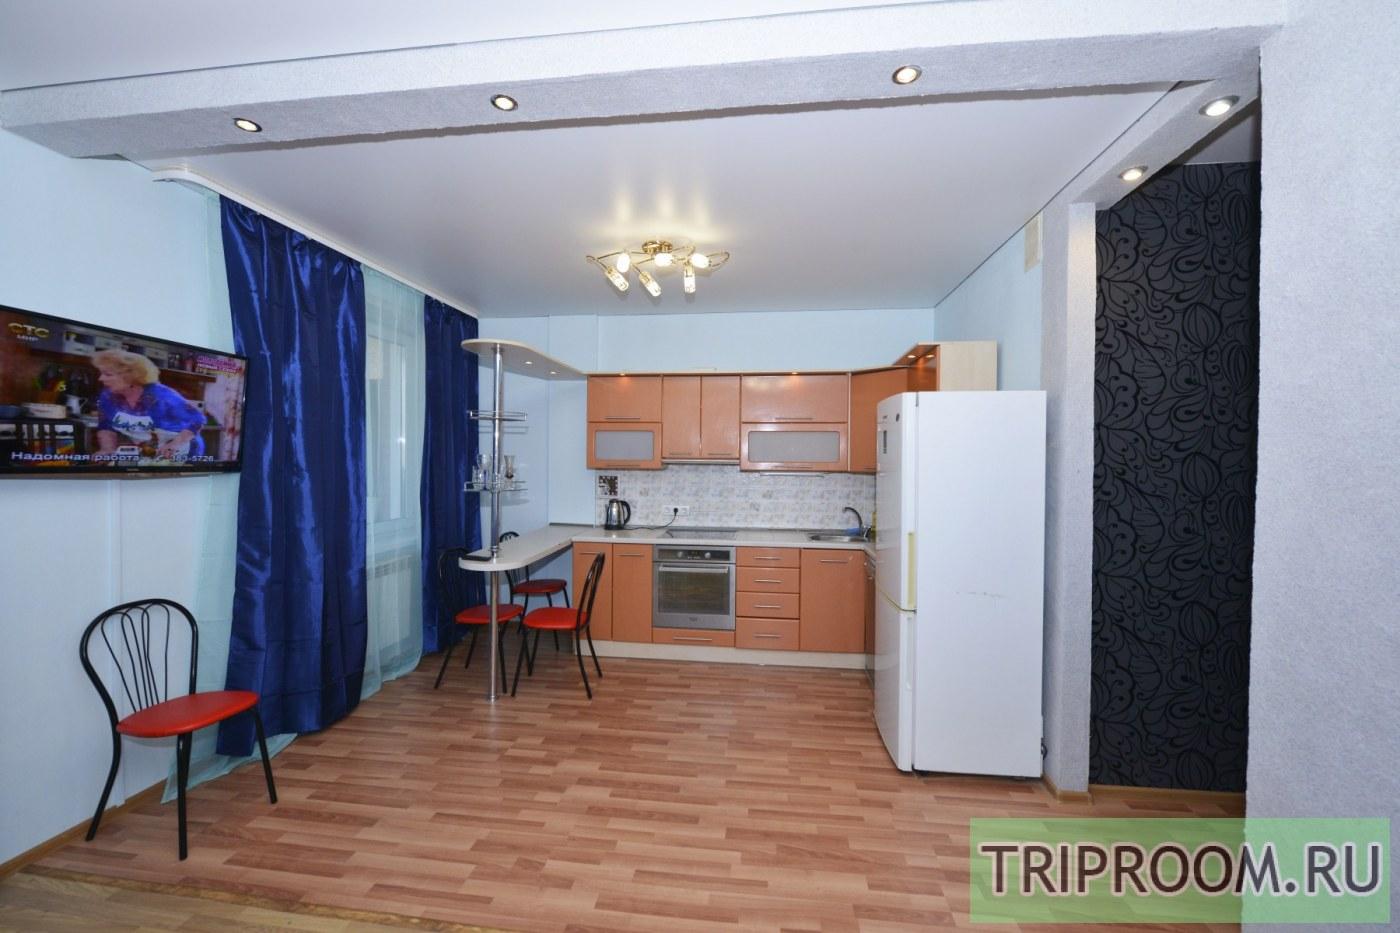 1-комнатная квартира посуточно (вариант № 40607), ул. Галущака улица, фото № 13